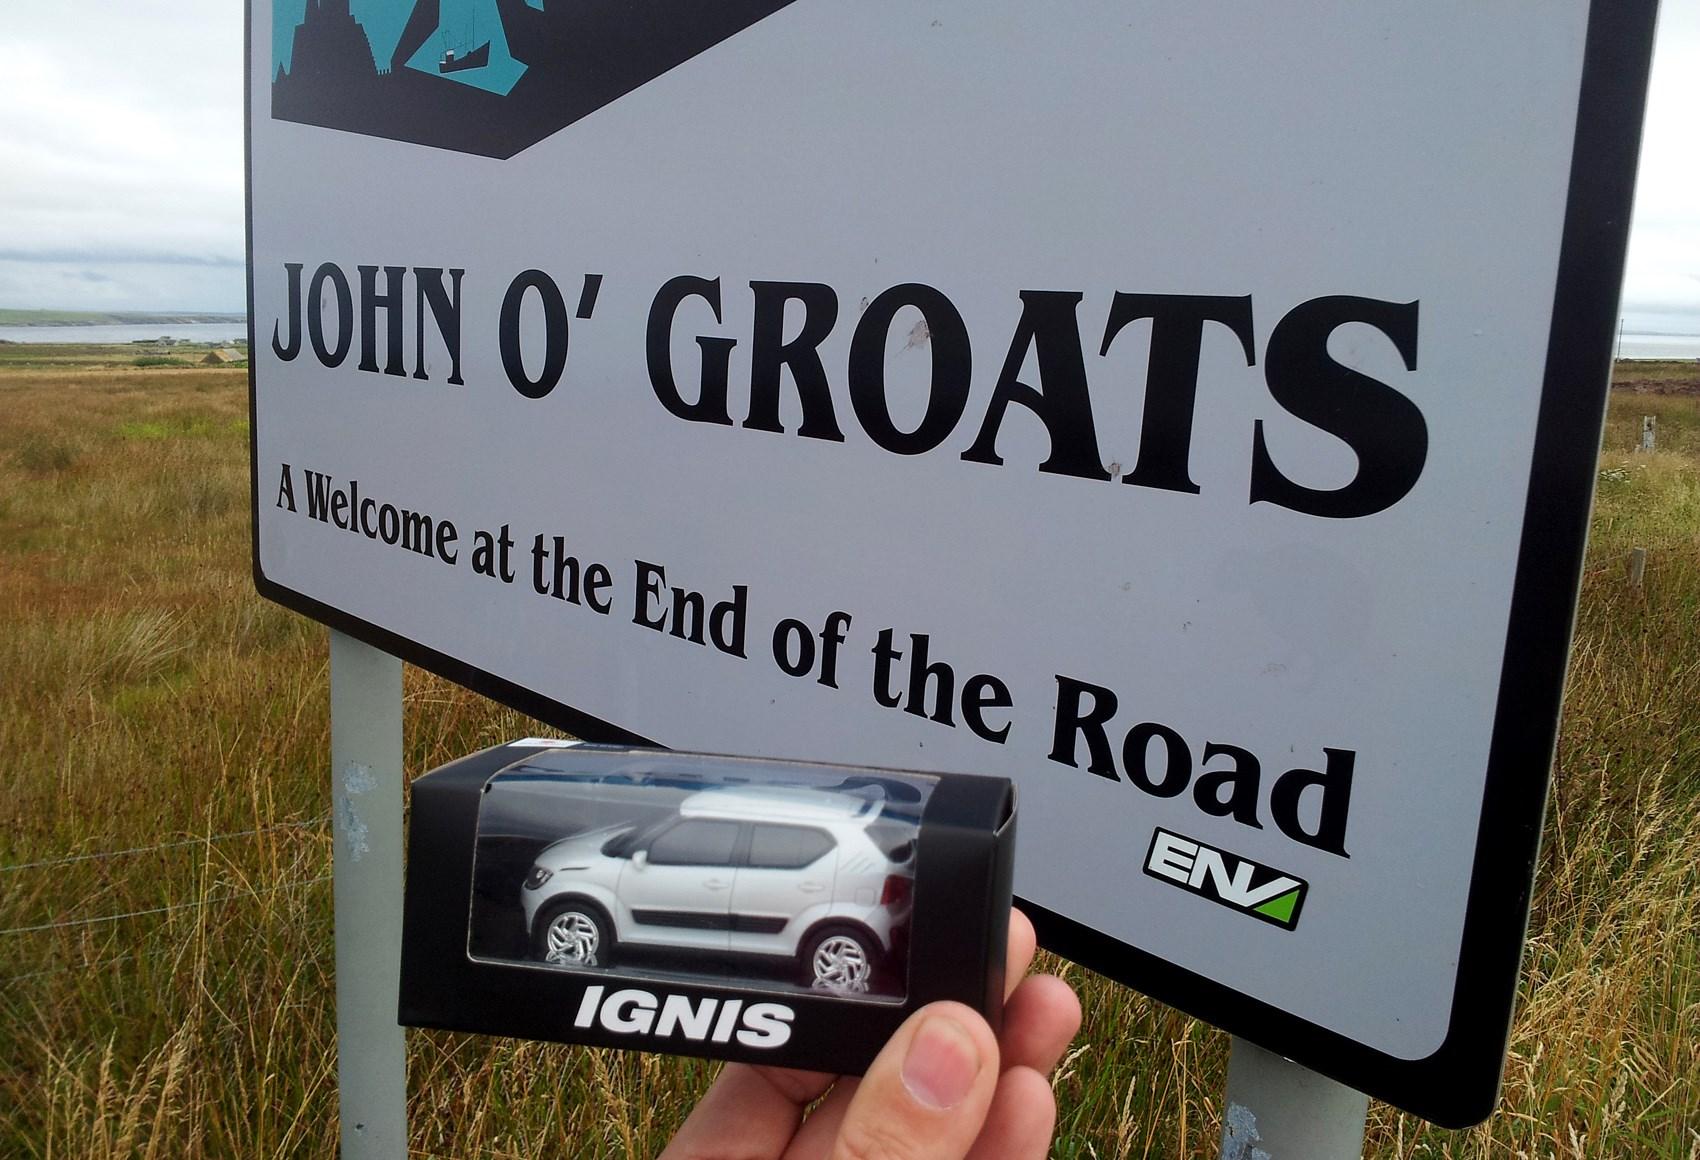 Suzuki Ignis model at JOG sign